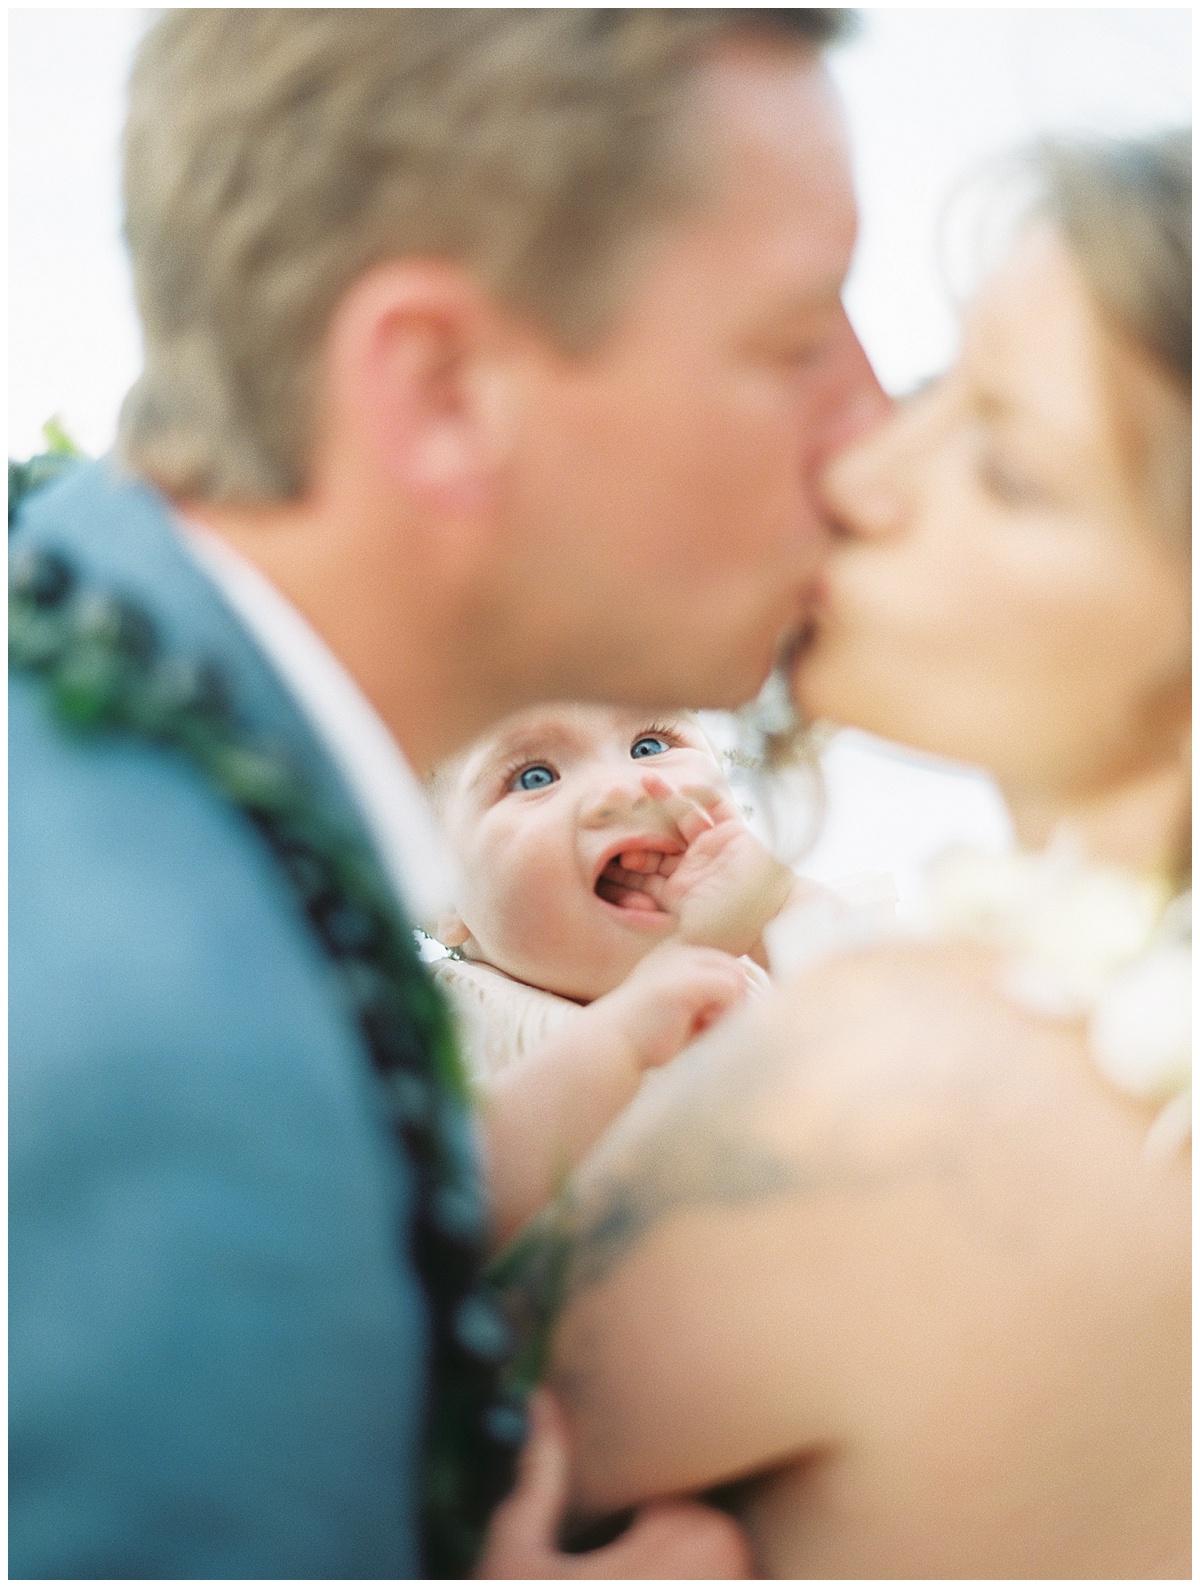 beach-elopement-bride-groom-kiss-while-daughter-watches.jpg